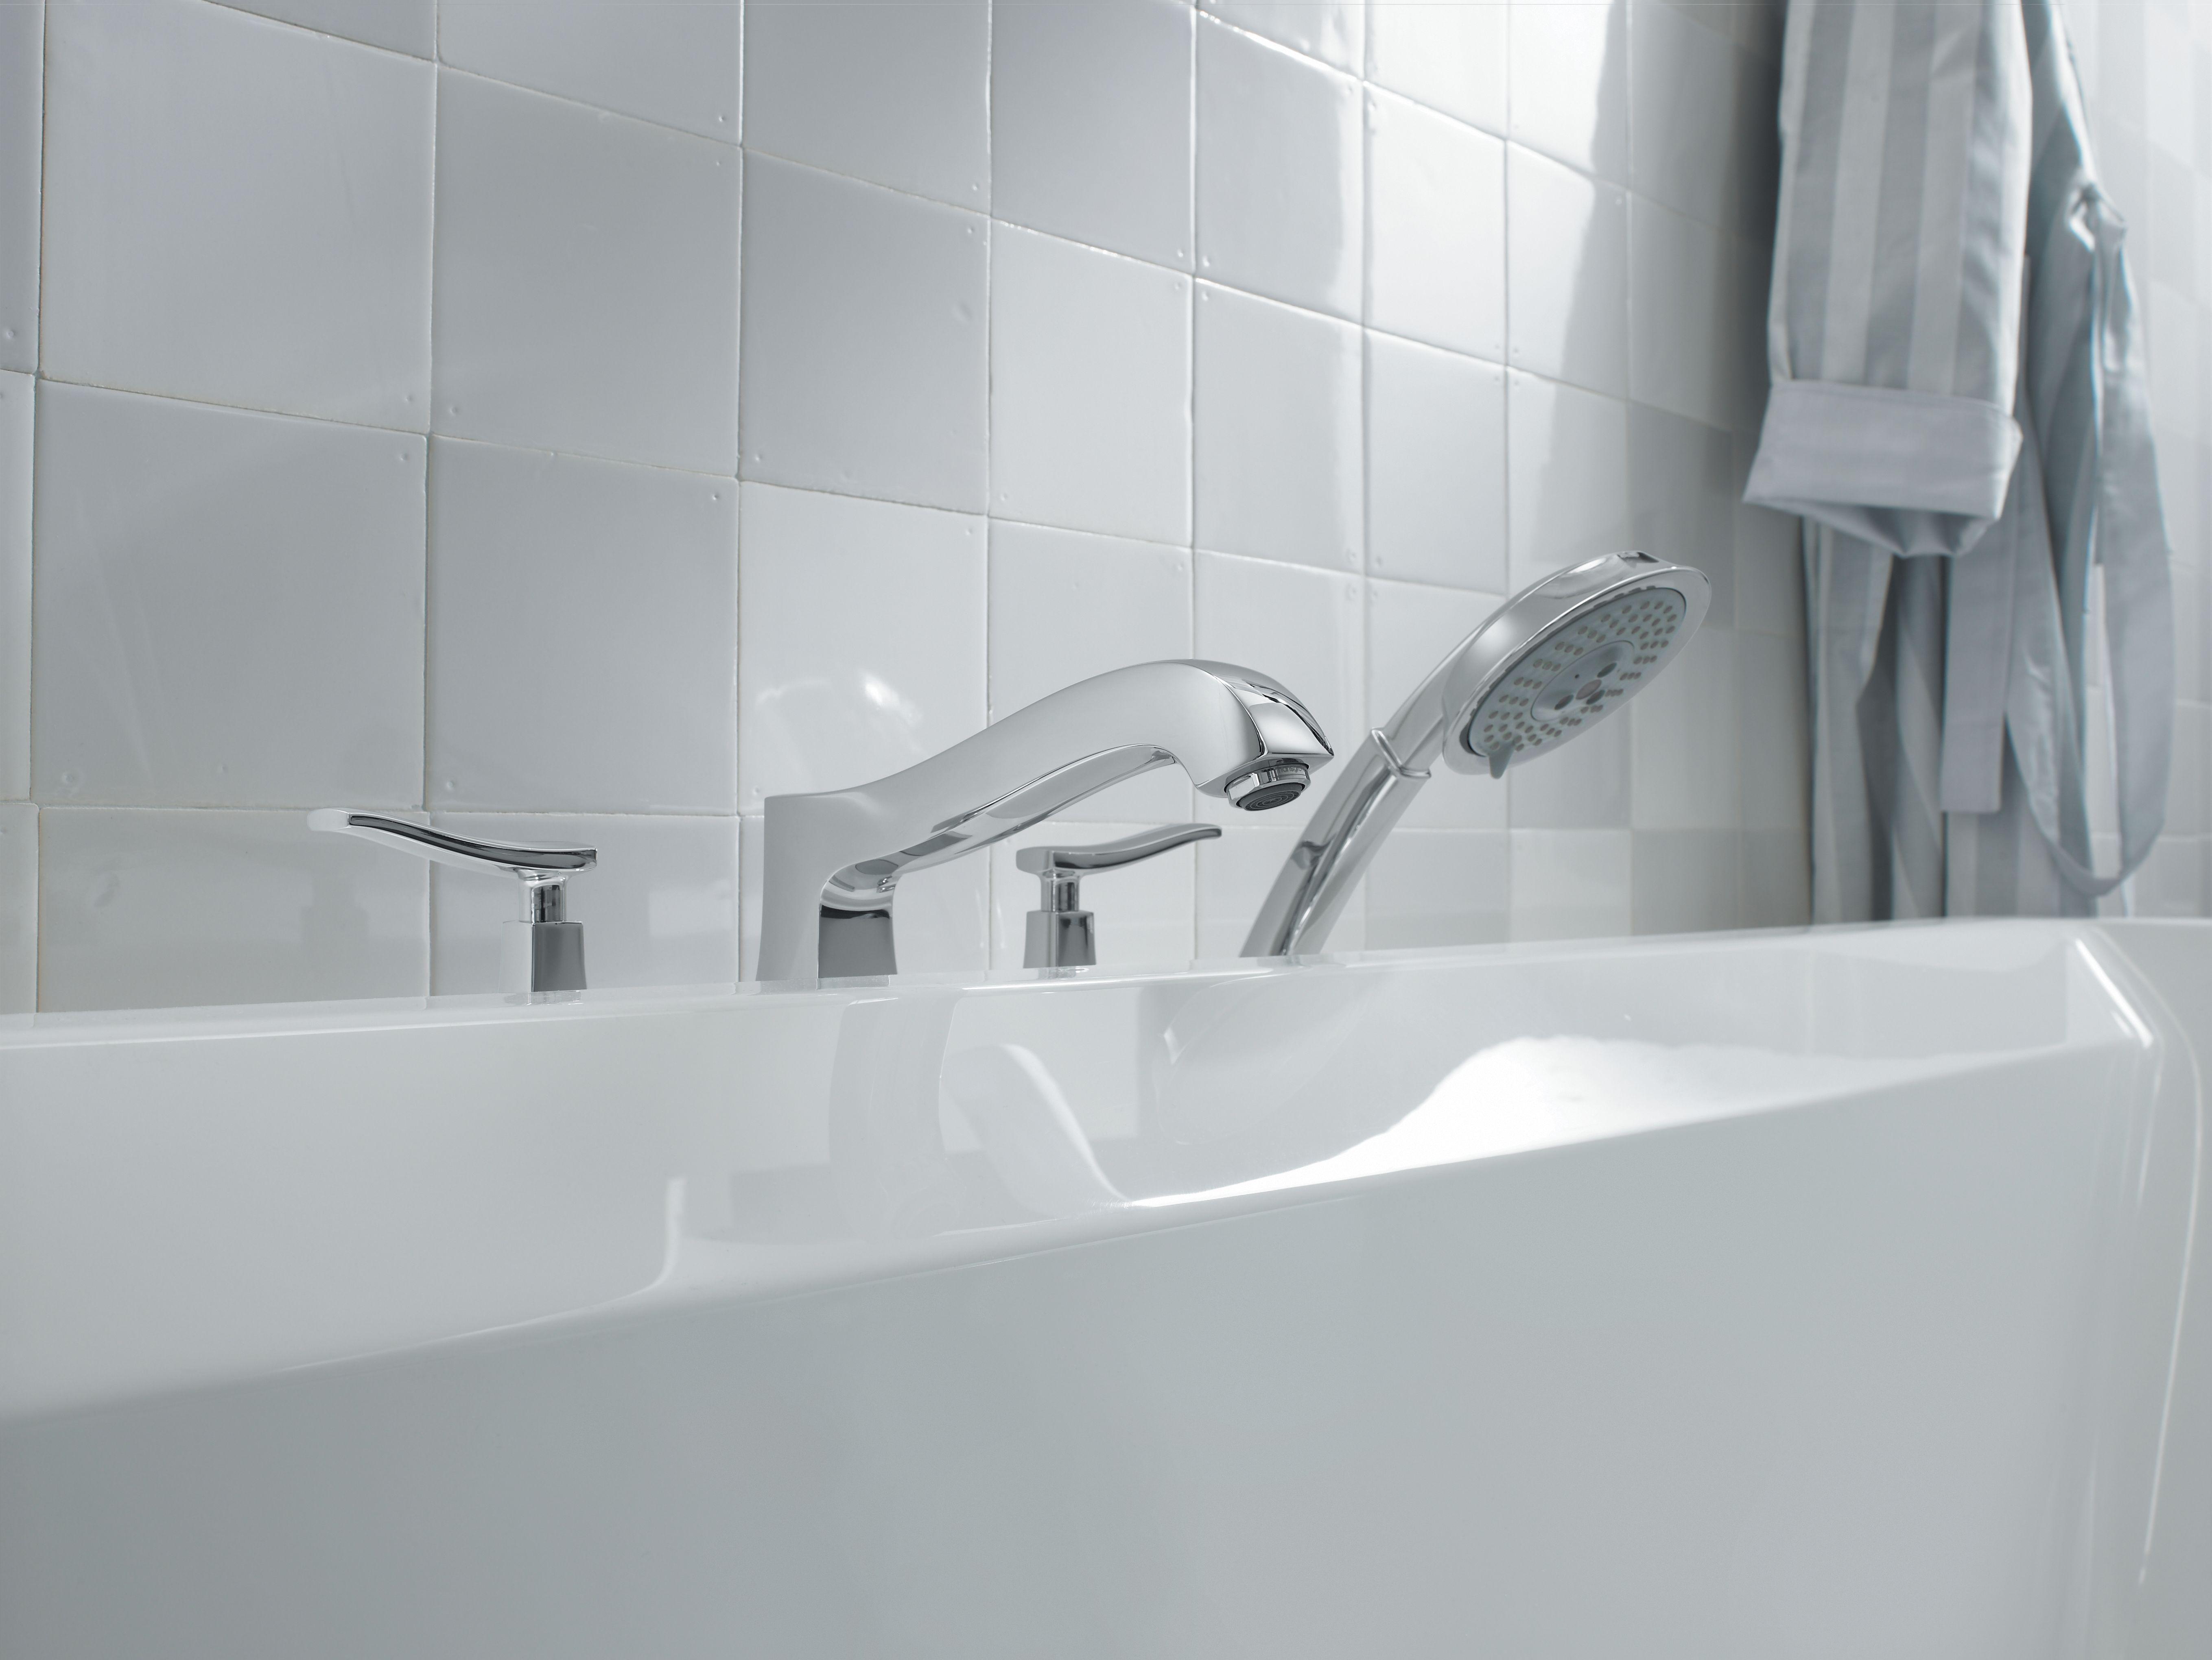 Hansgrohe 31314821 Brushed Nickel Metris C Roman Tub Filler Faucet ...